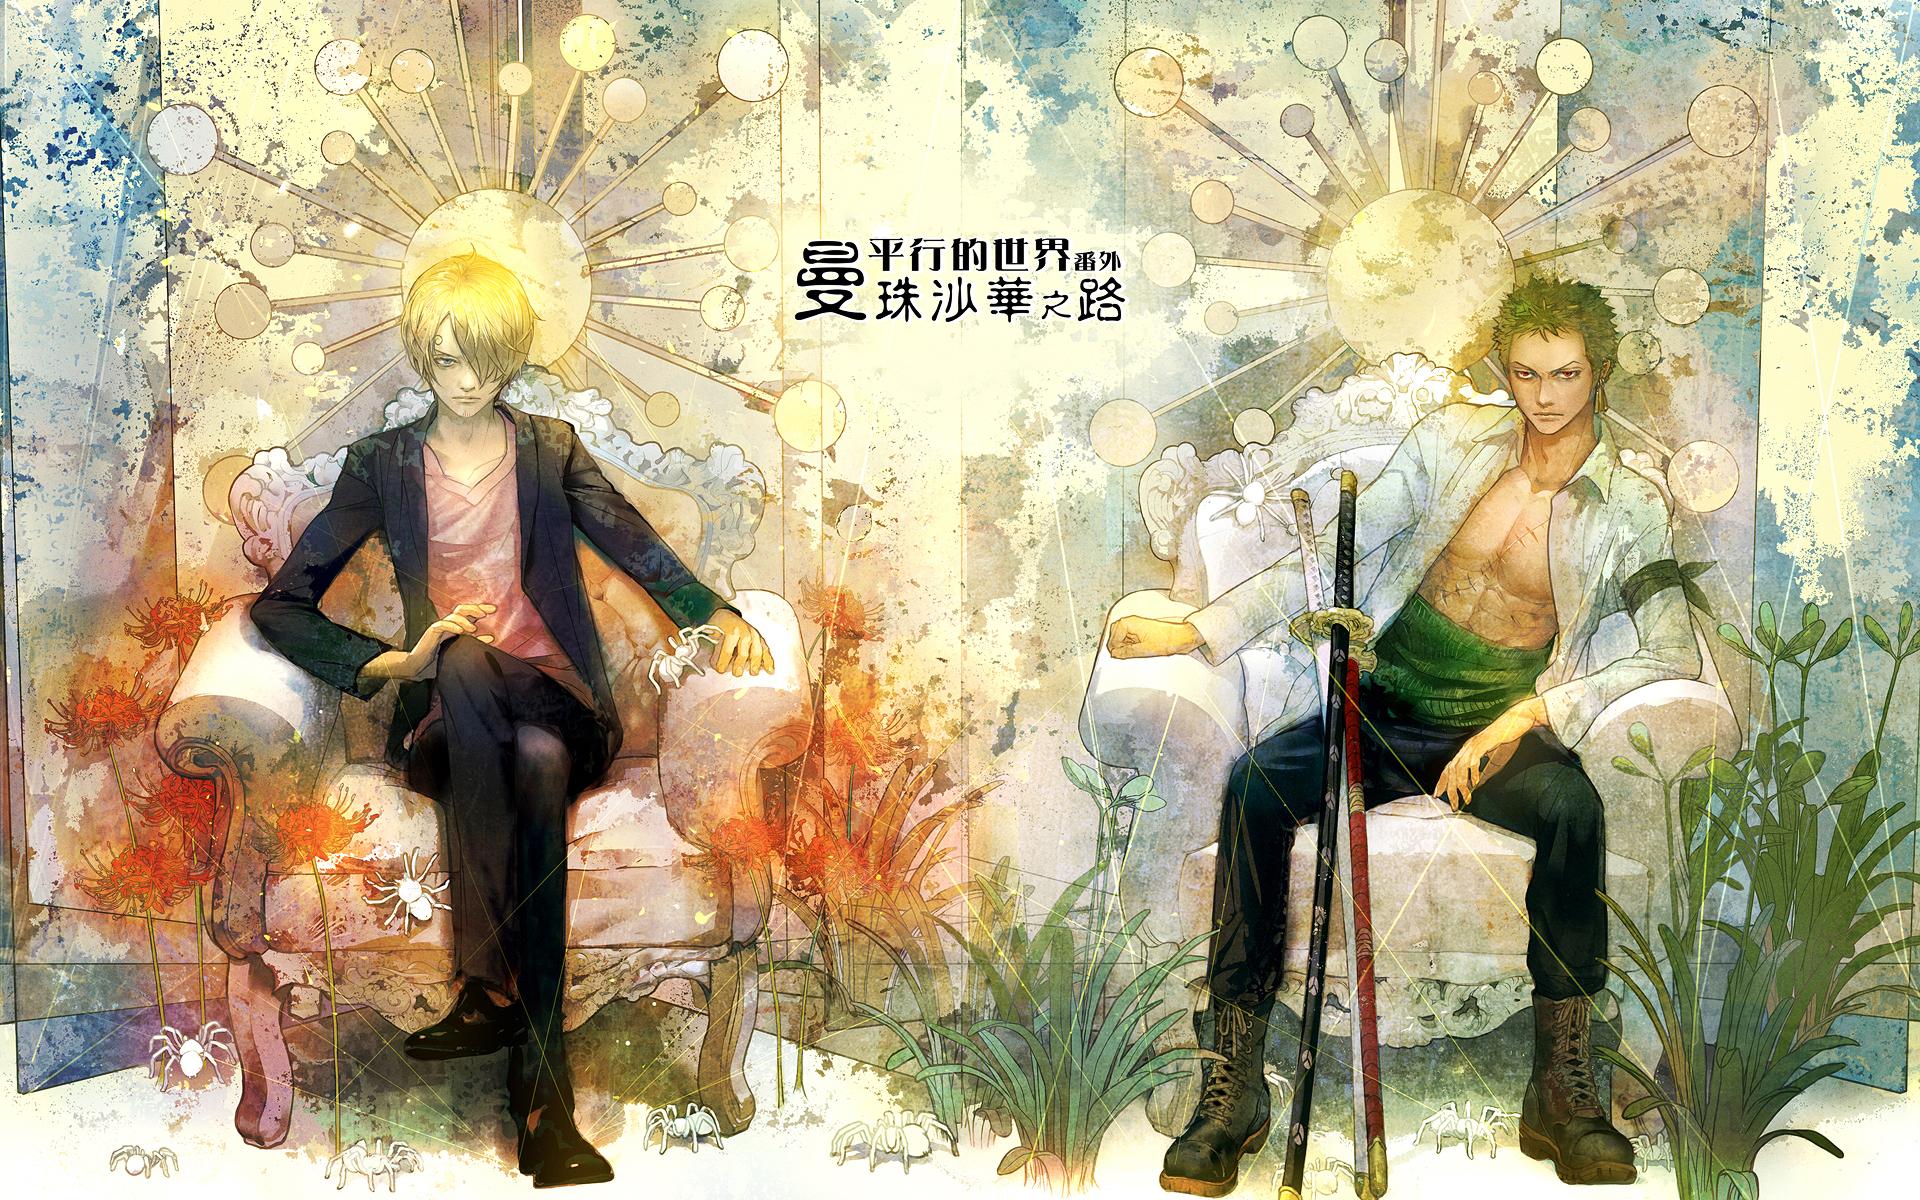 Zoro and Sanji HD Wallpaper | Background Image | 1920x1200 | ID:606669 - Wallpaper Abyss